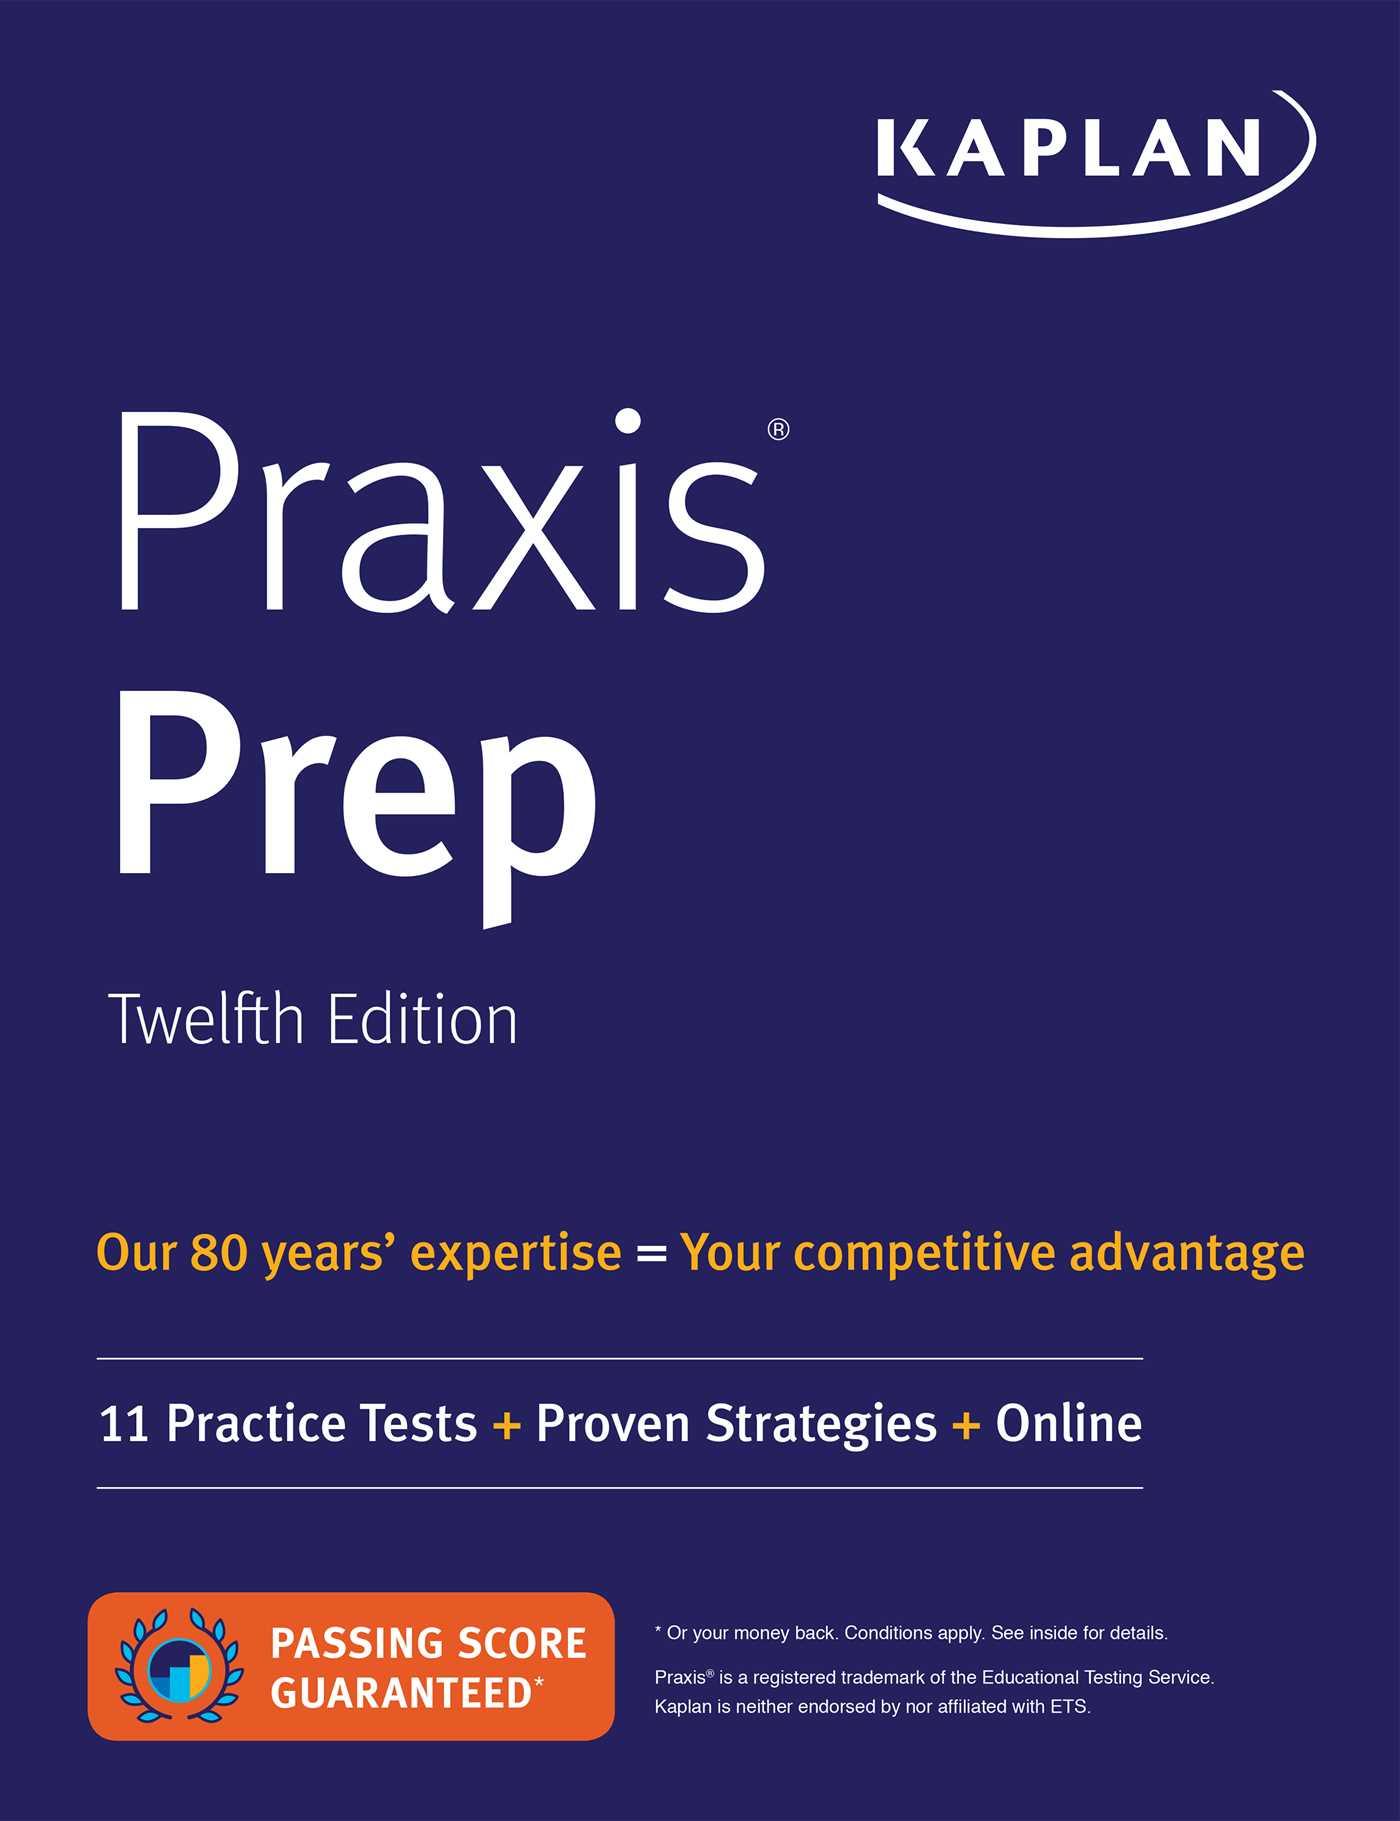 Book Cover Image (jpg): Praxis Prep